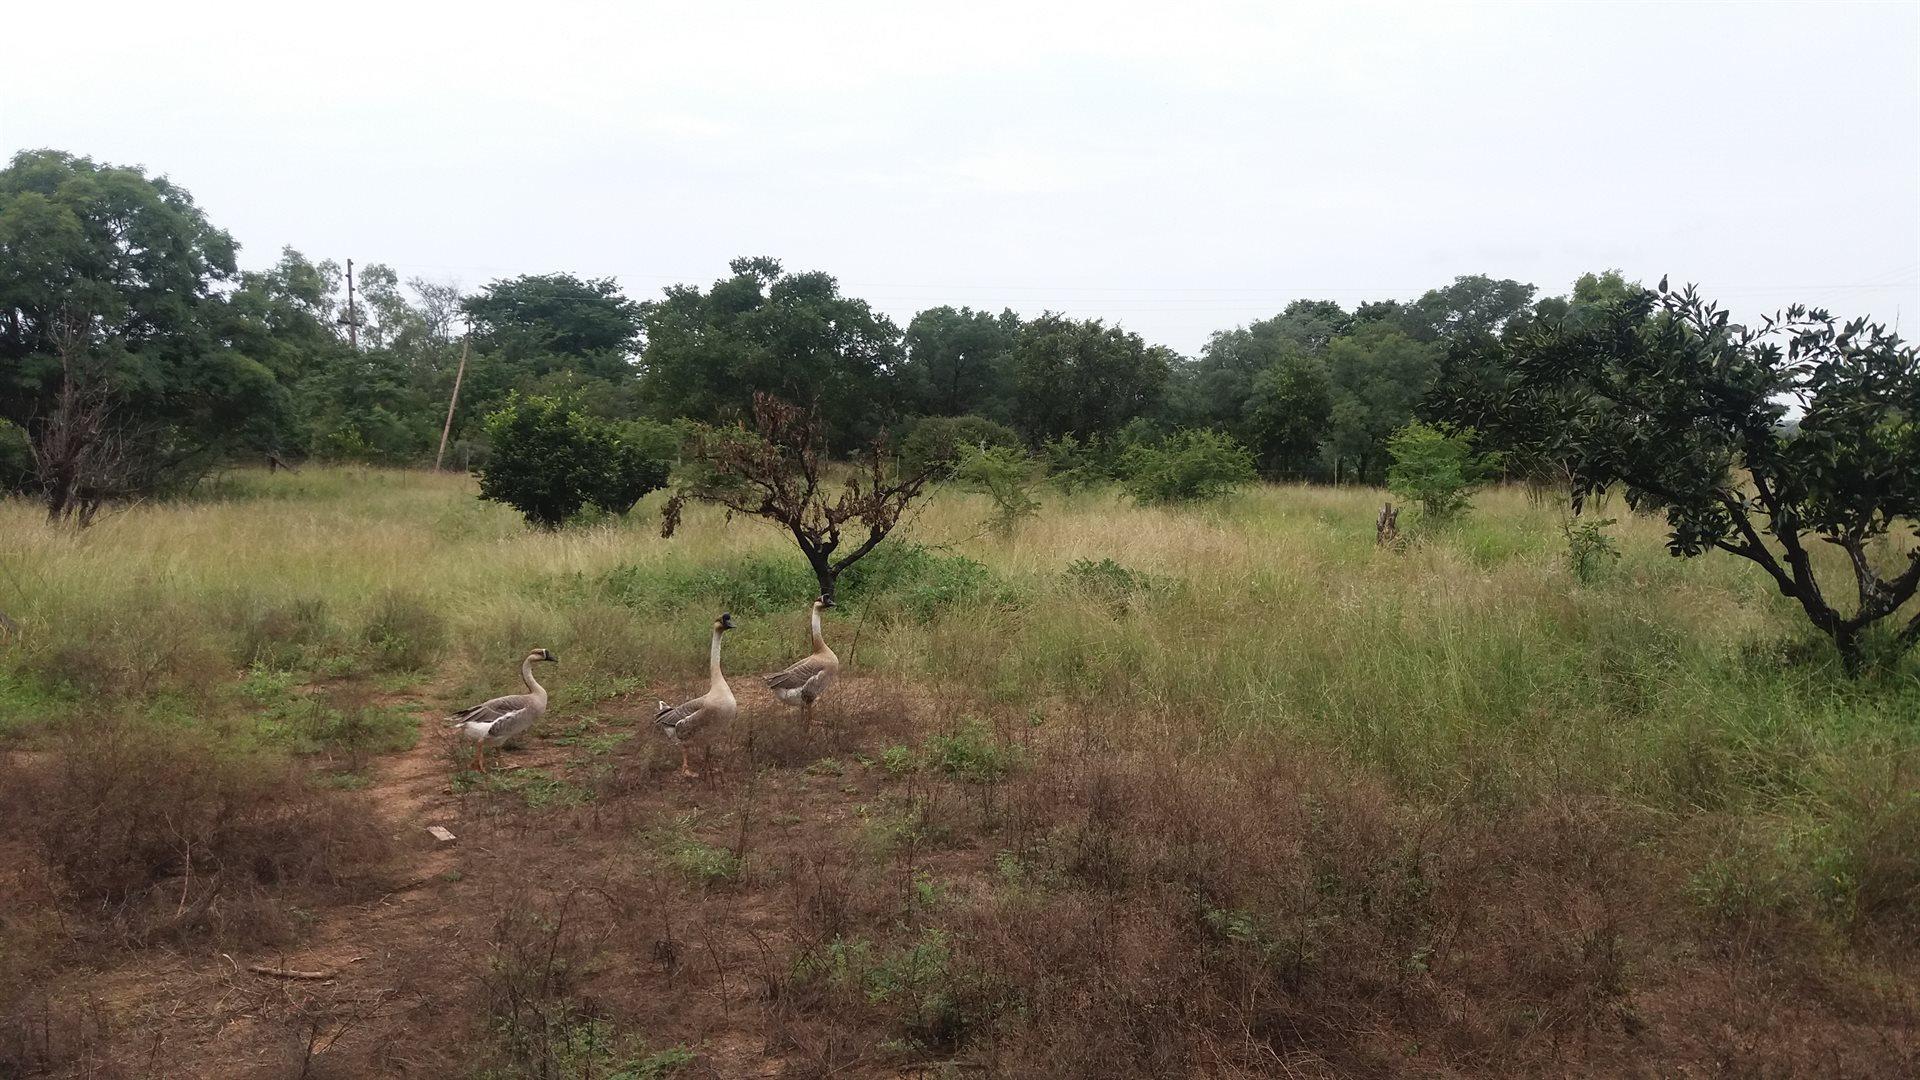 Thabazimbi, Kromdraai Property  | Houses For Sale Kromdraai, Kromdraai, Farms 3 bedrooms property for sale Price:780,000